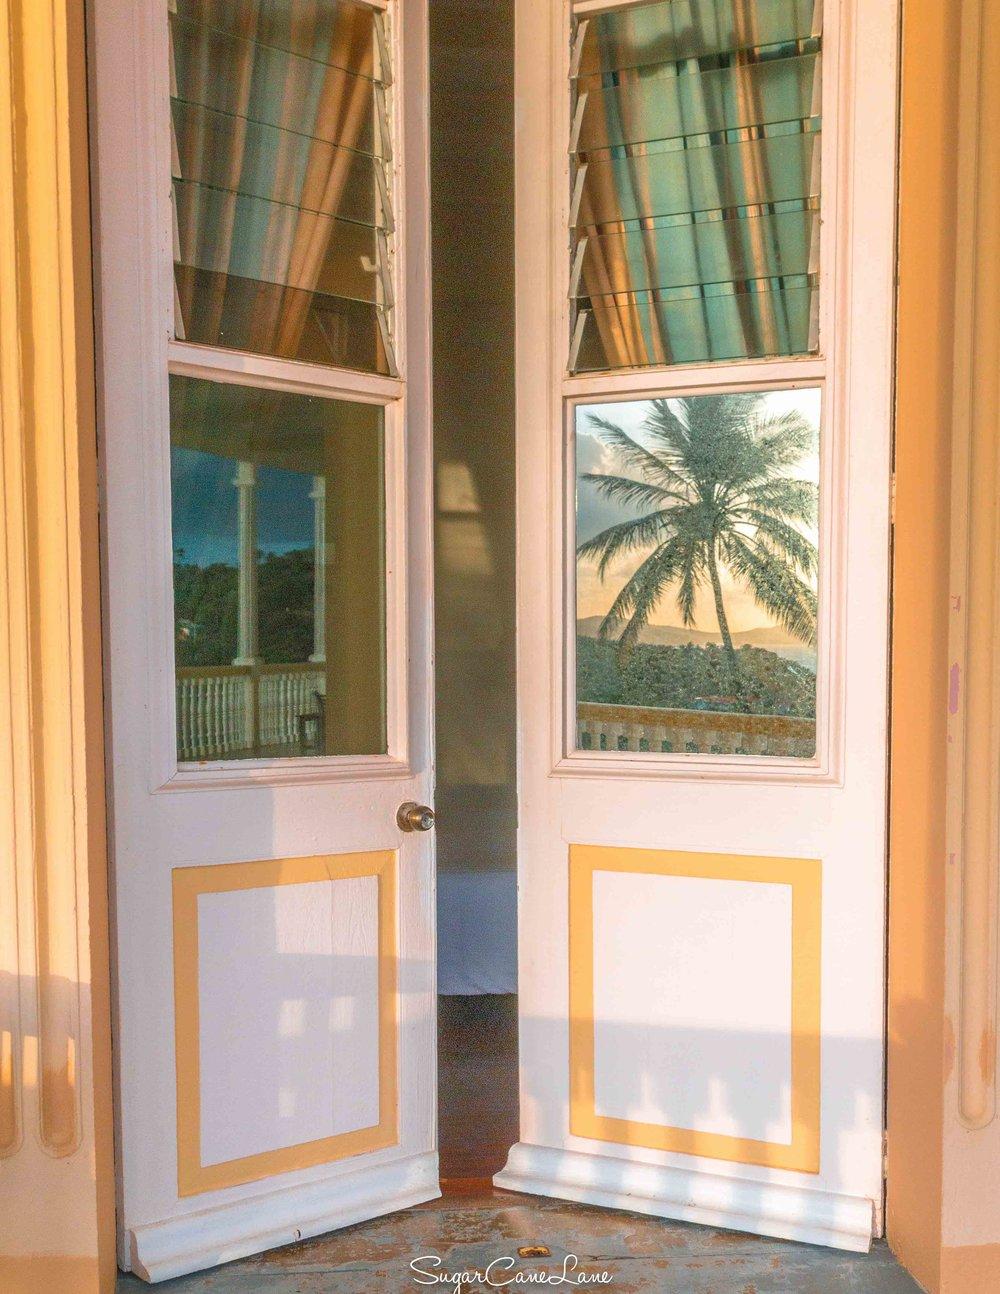 martinique_domaine-saint-aubin_doors_2052.jpg